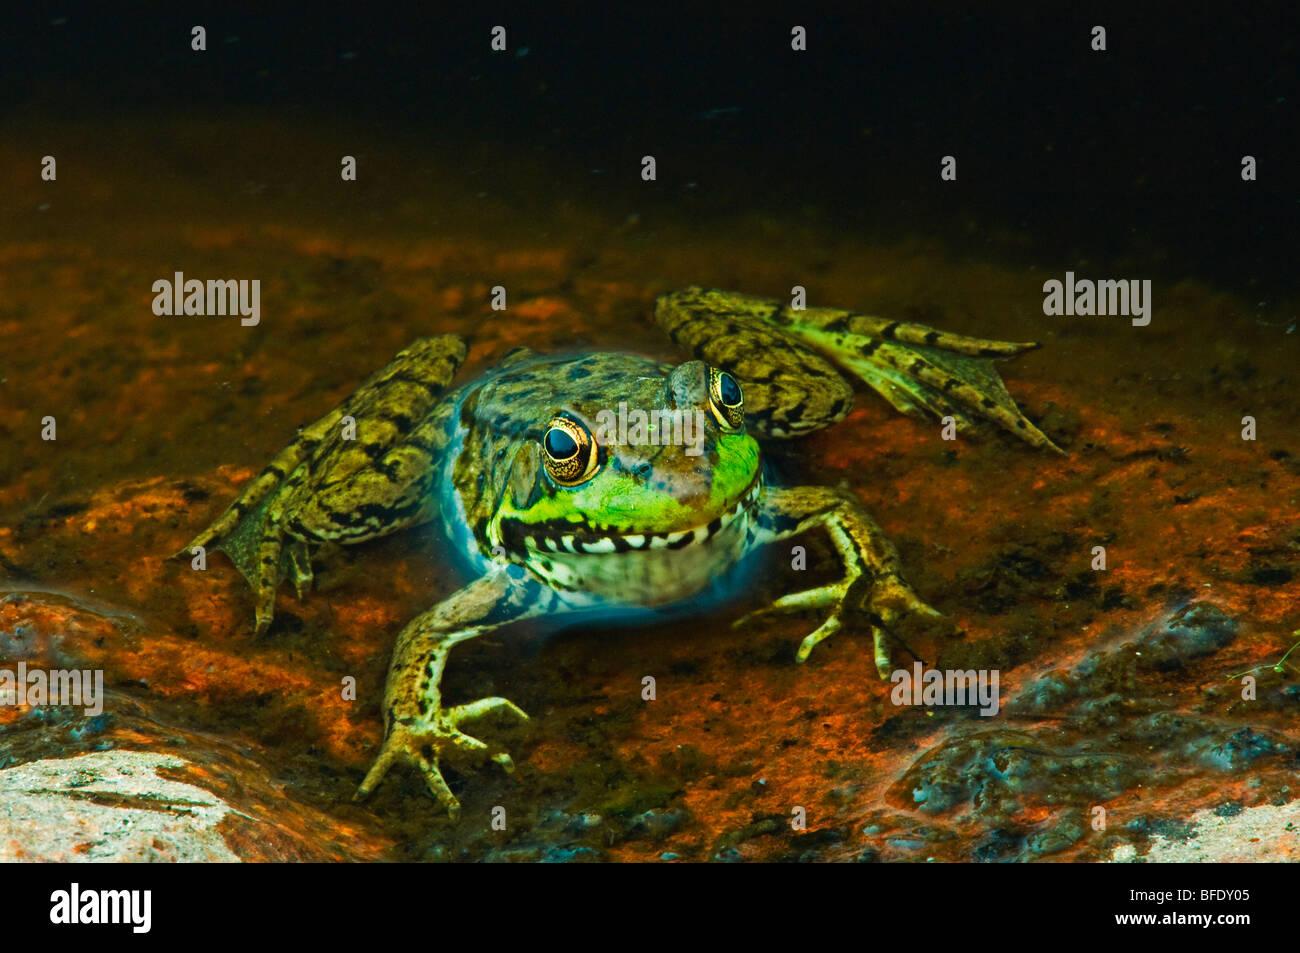 Nahaufnahme des grünen Frosch (Rana Clamitans) am Rand des Teiches, Killarney Provincial Park, Ontario, Kanada Stockbild